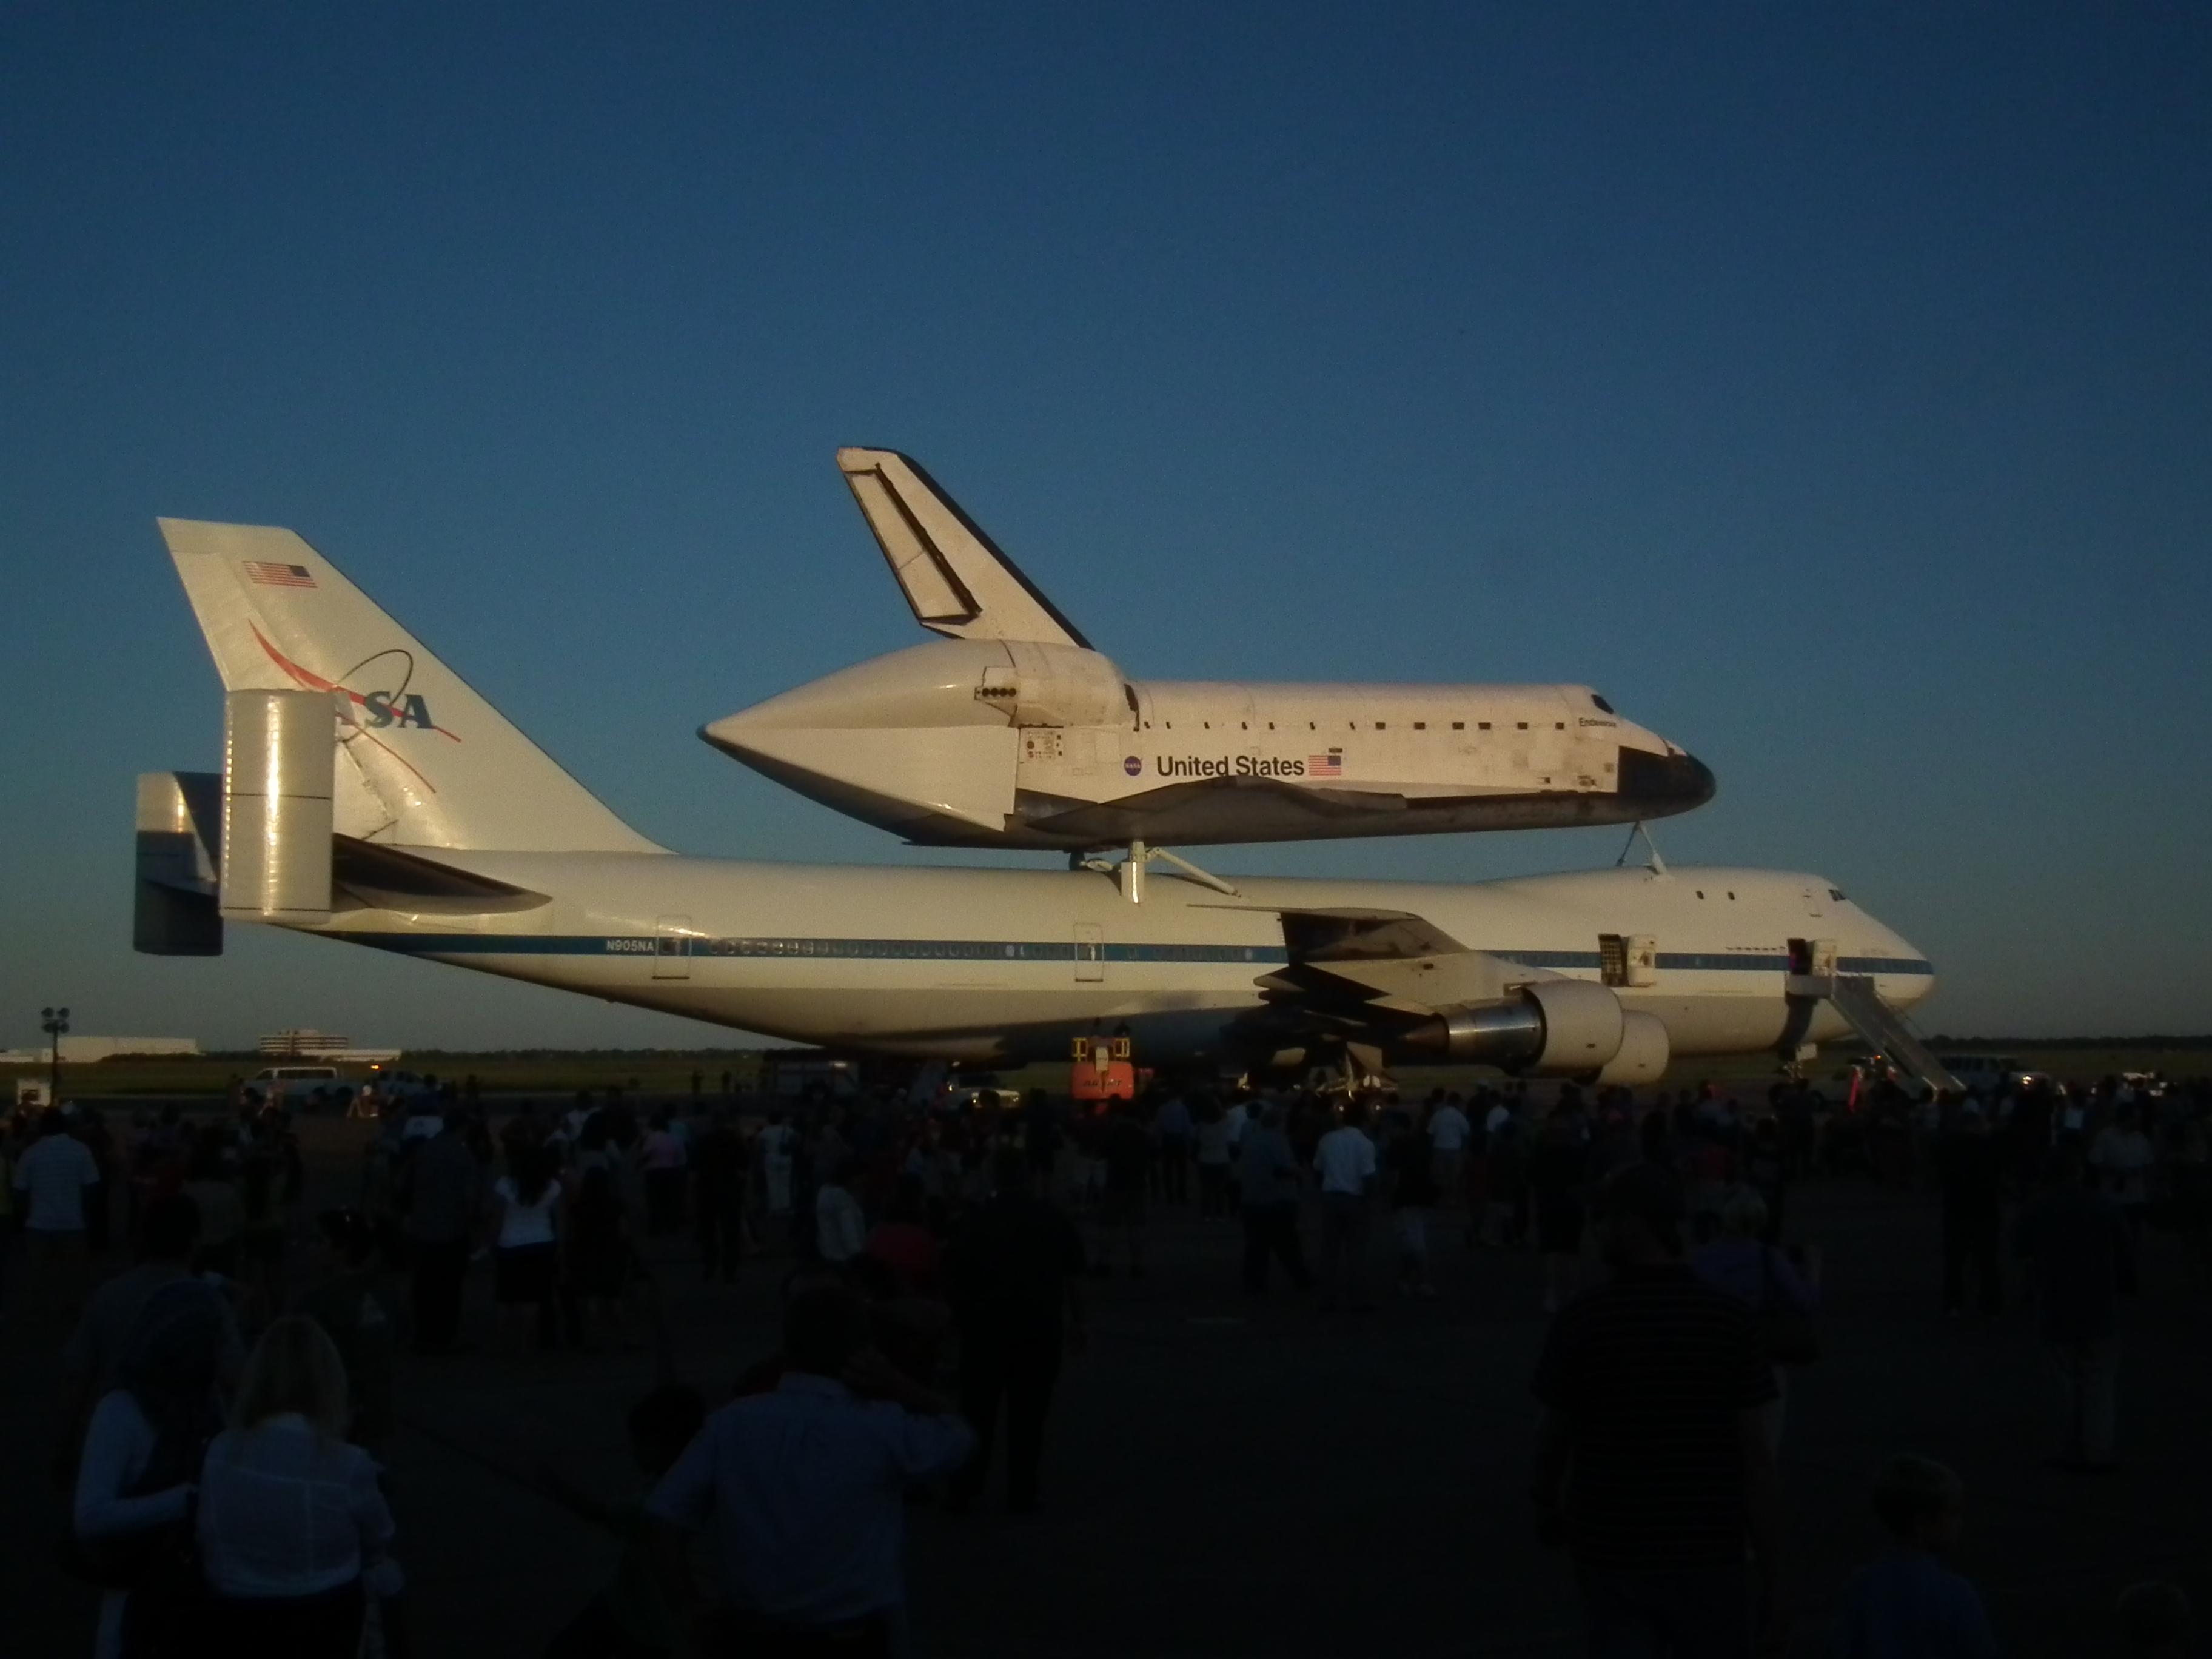 houston space shuttle graffiti - photo #24